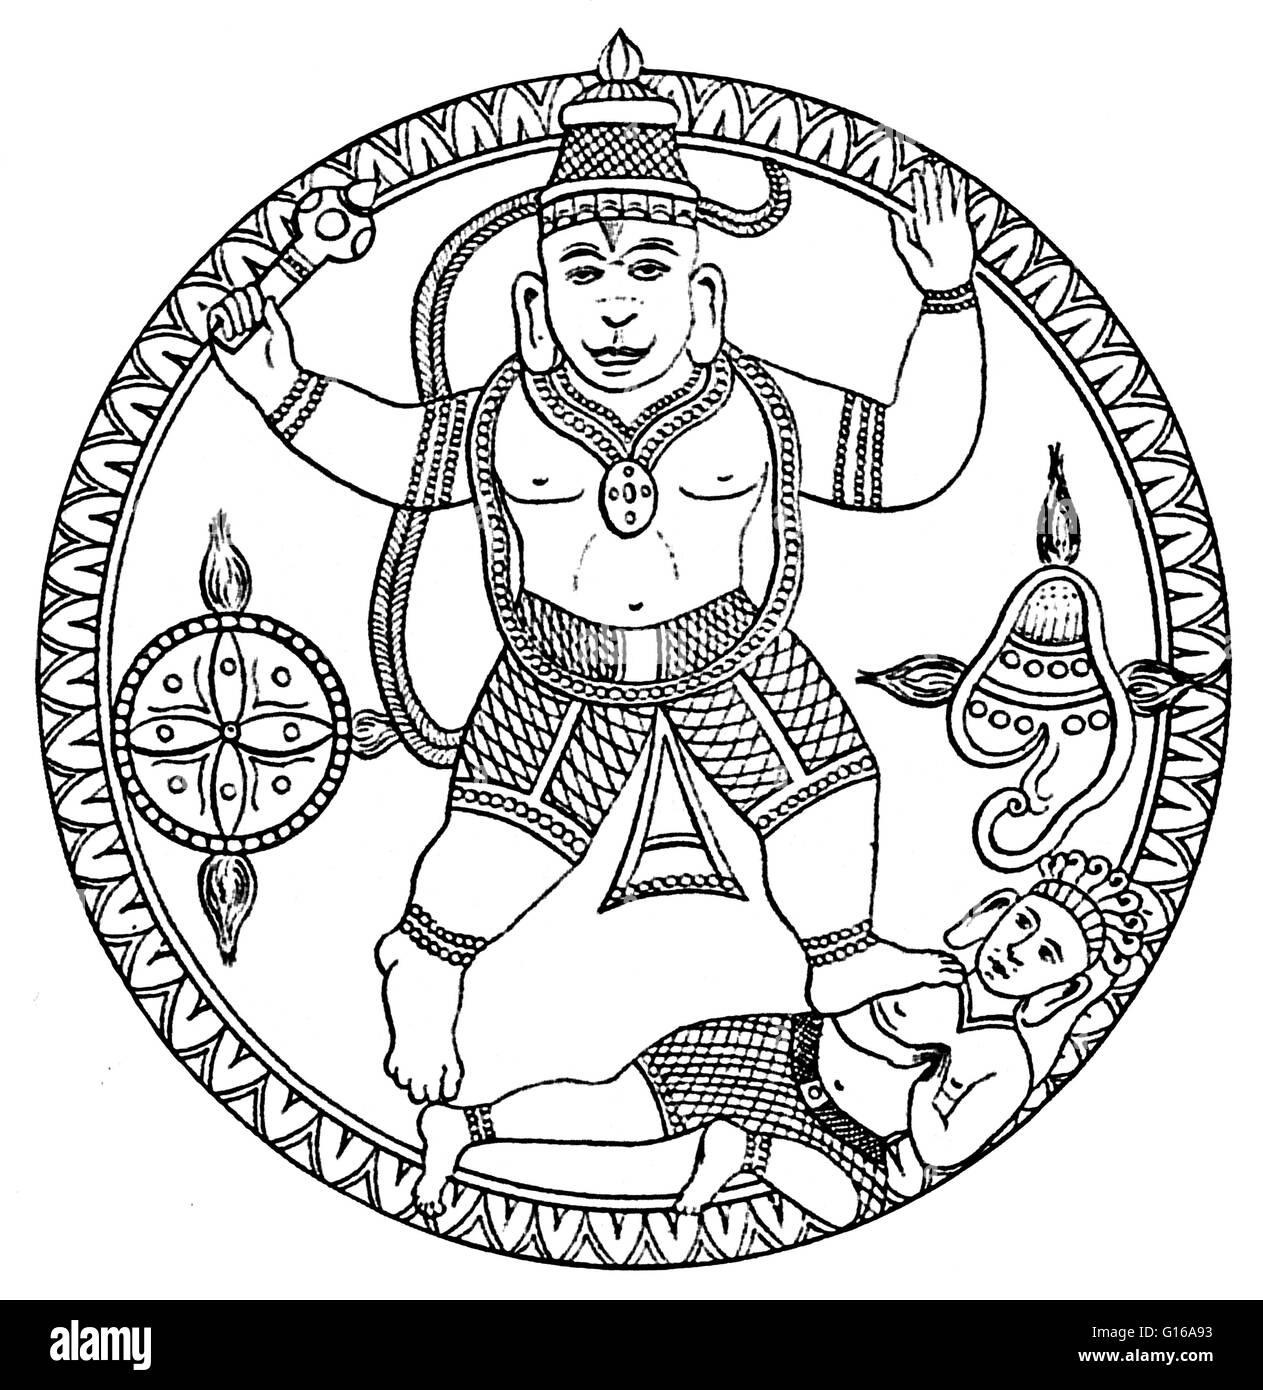 Hanuman, together with Ganesha and Garuda, is one of the three principal animal deities in the Hindu Mythology that - Stock Image